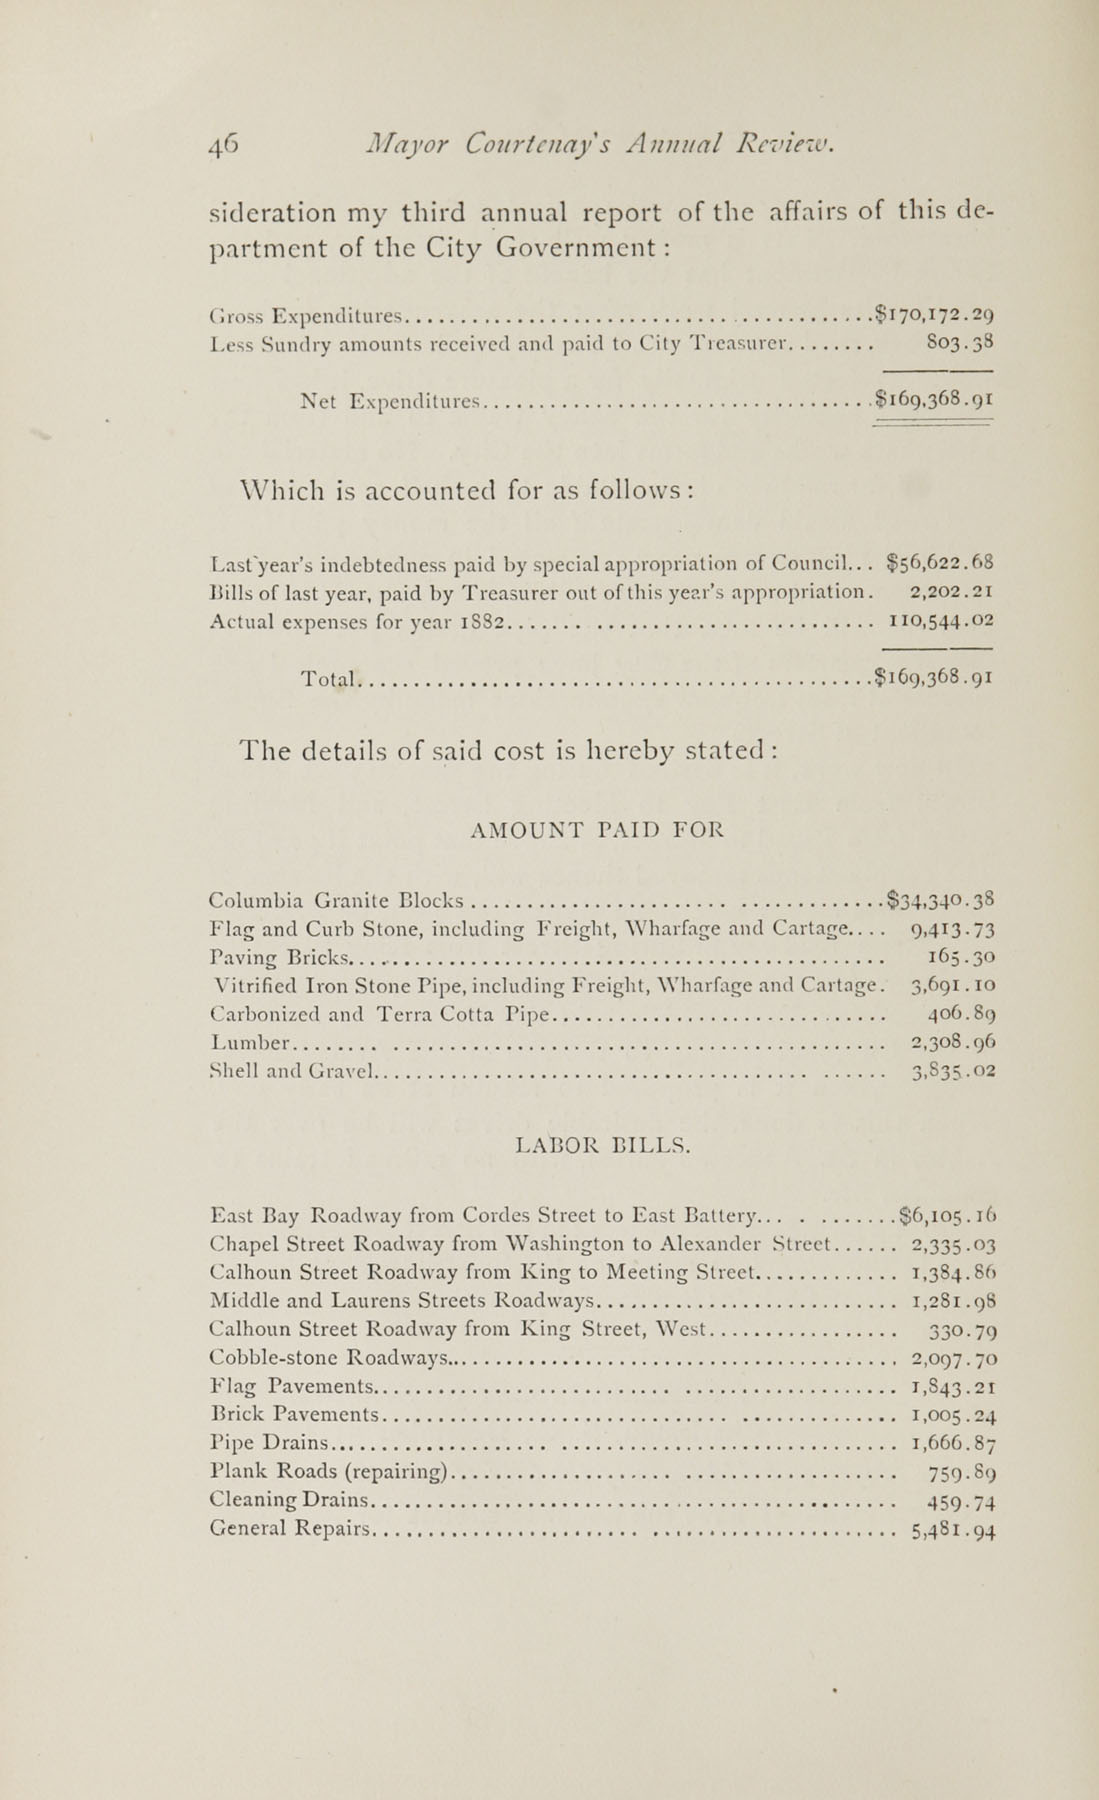 Charleston Yearbook, 1882, page 46